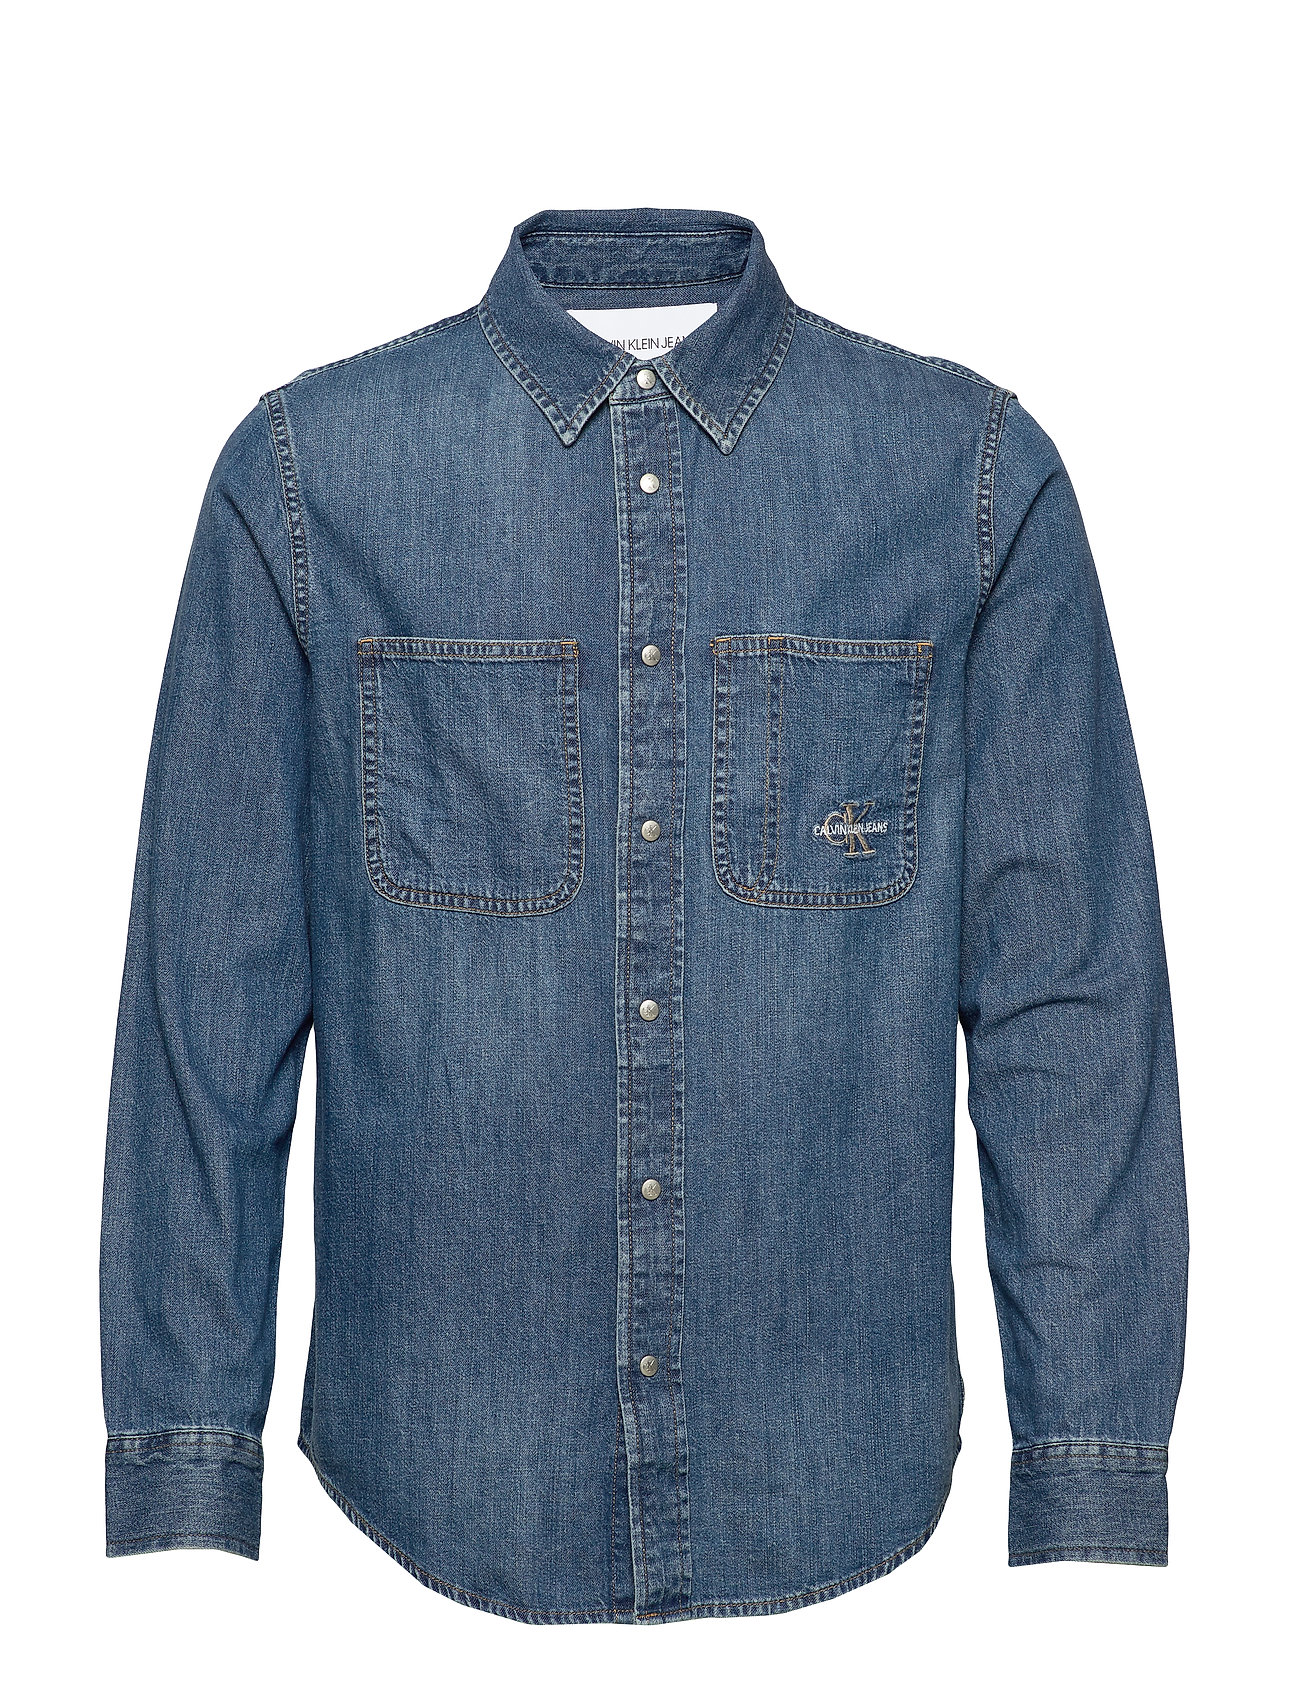 Calvin Klein Jeans ICONIC SHIRT - CA051 BRIGHT BLUE